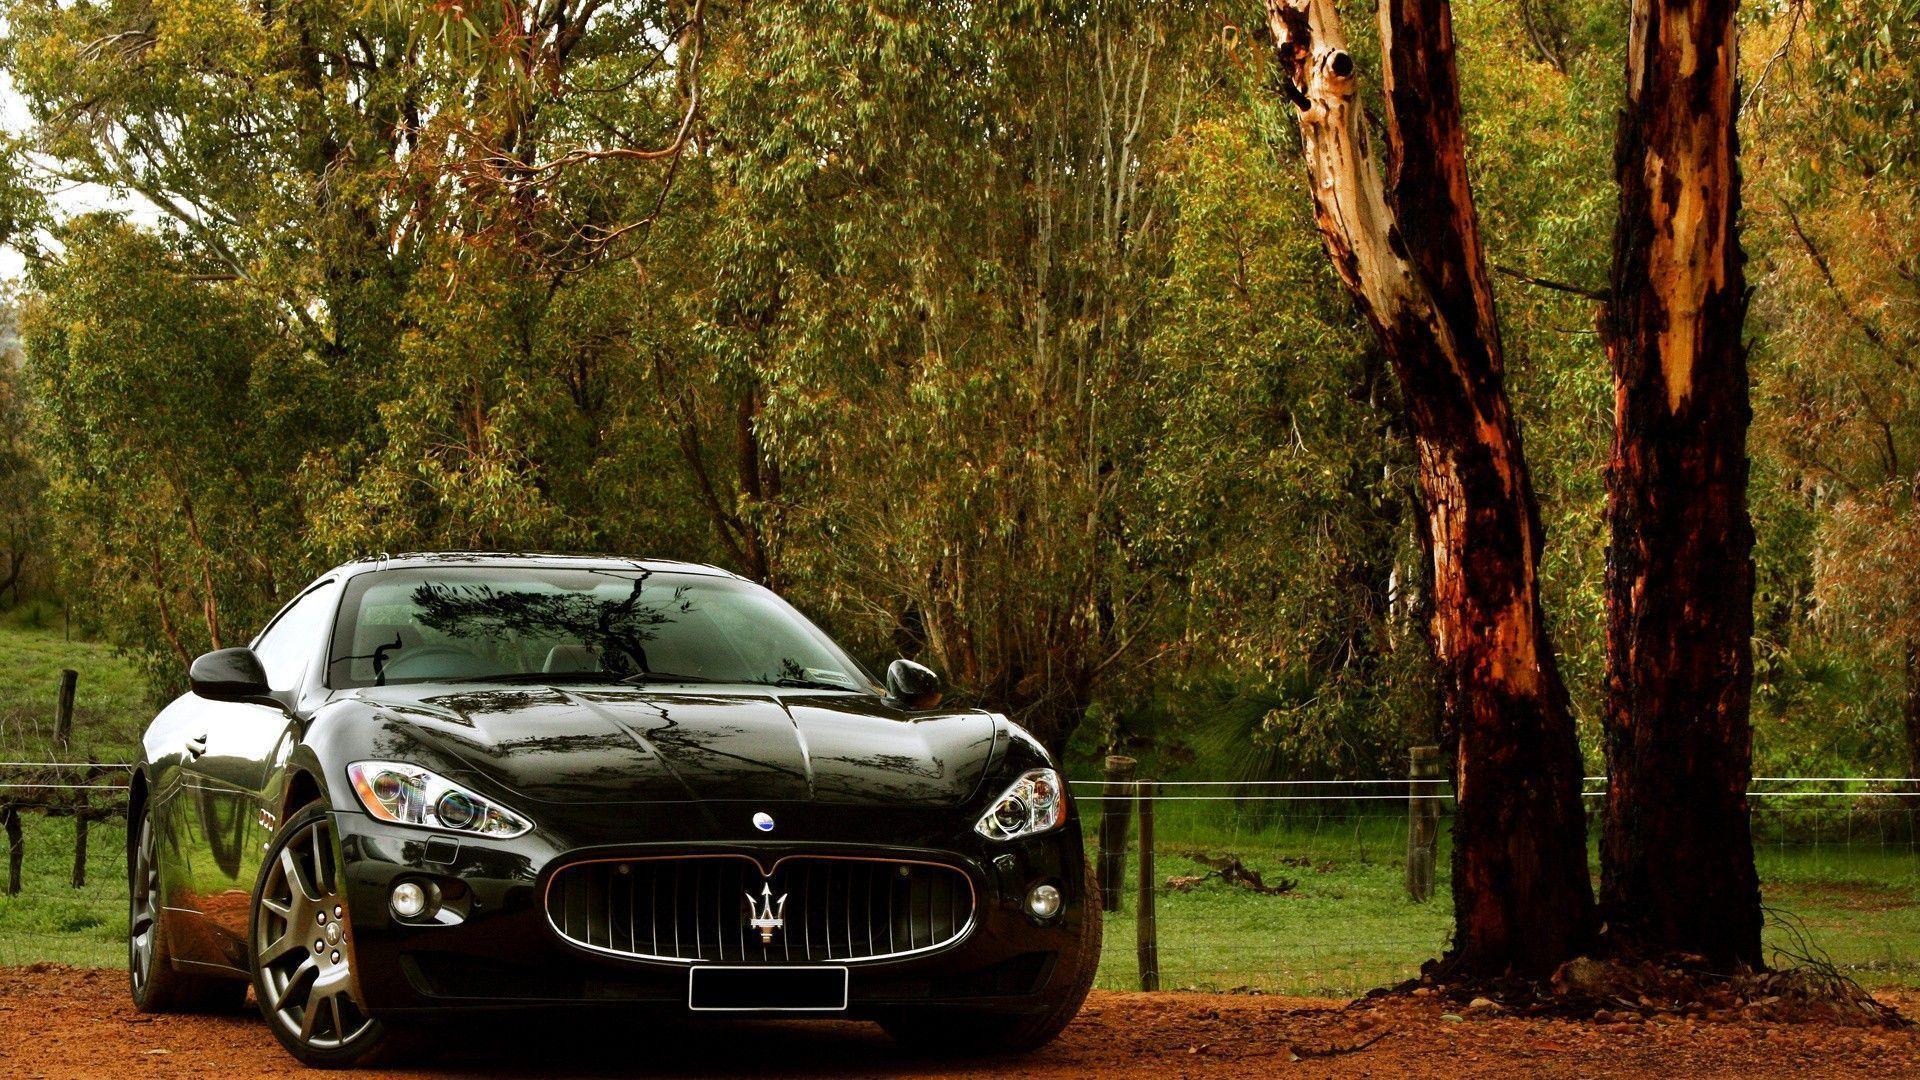 Best Bmw Car Wallpapers Maserati Wallpapers Wallpaper Cave